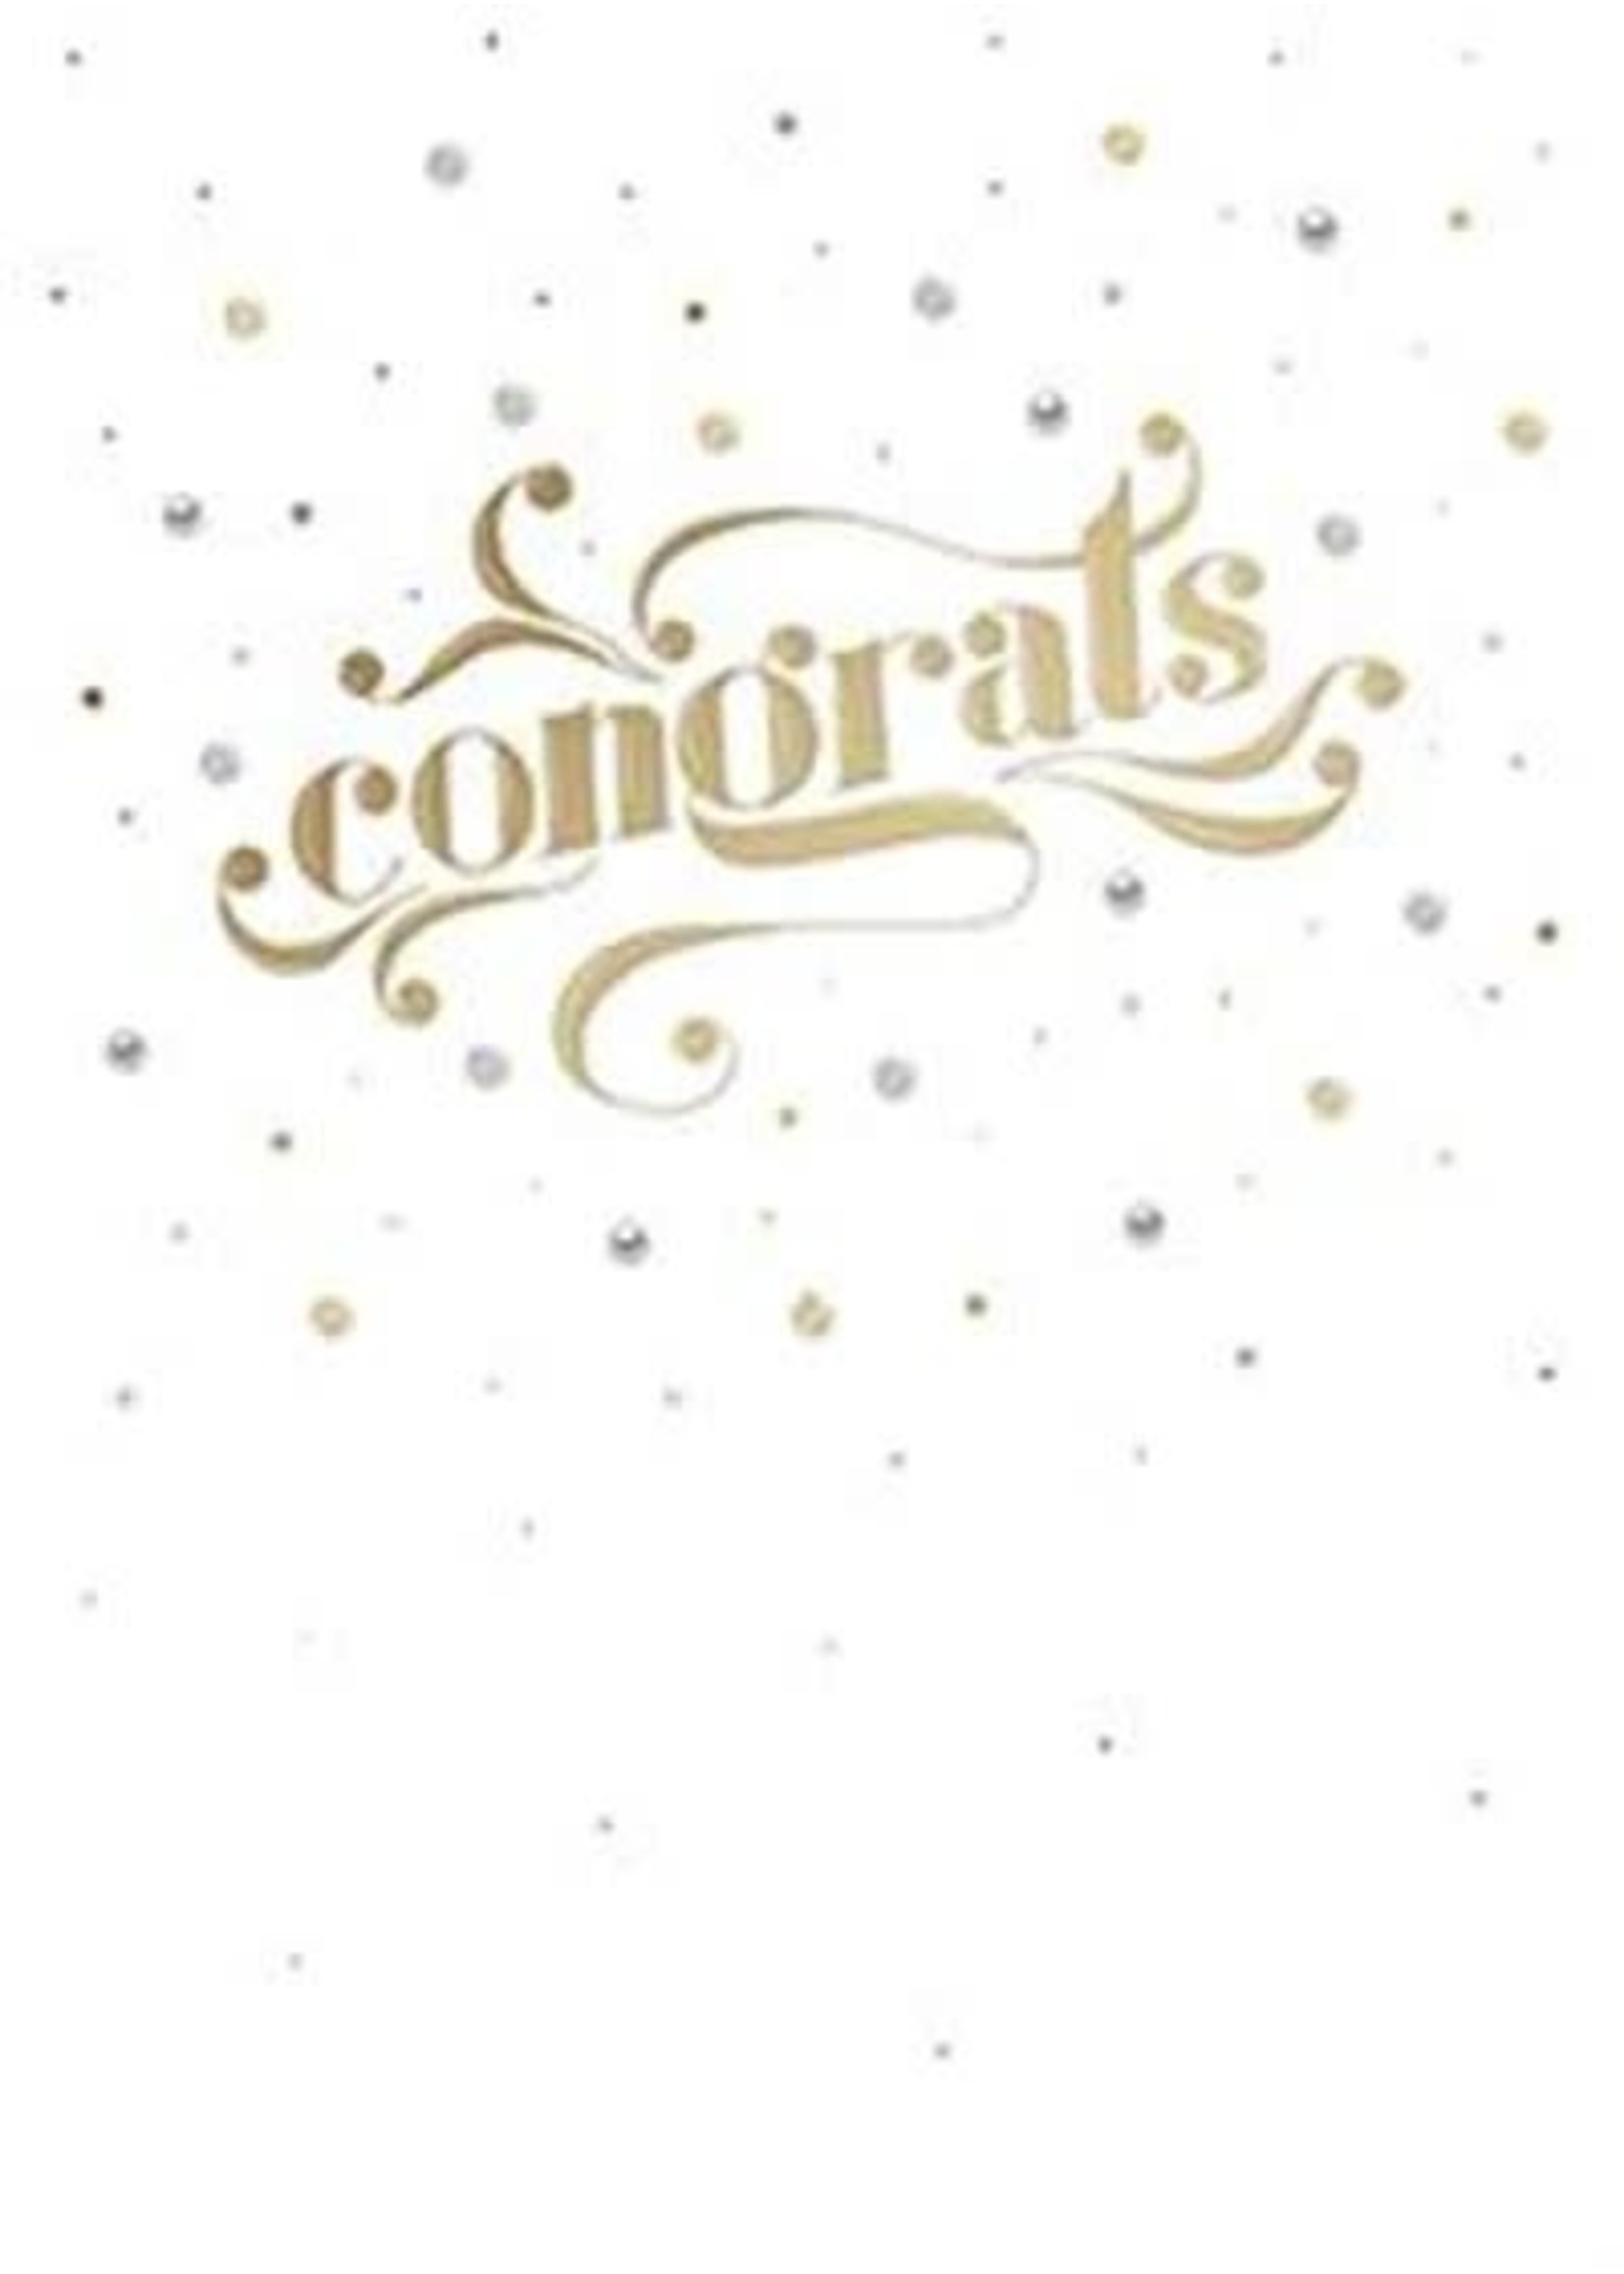 Design Design Typographical Congrats Burst Card